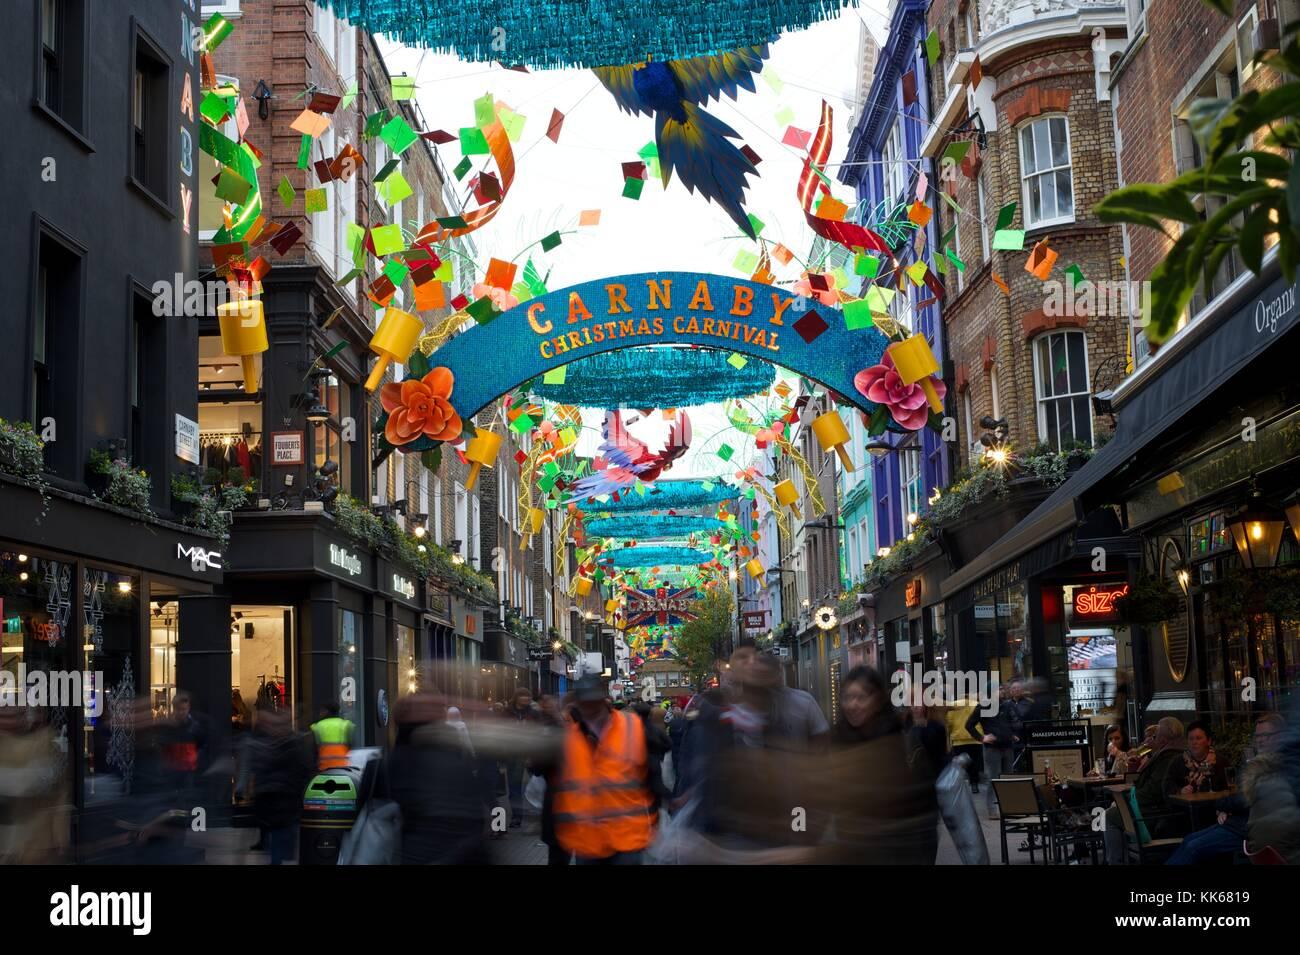 Carnaby street Photo Stock